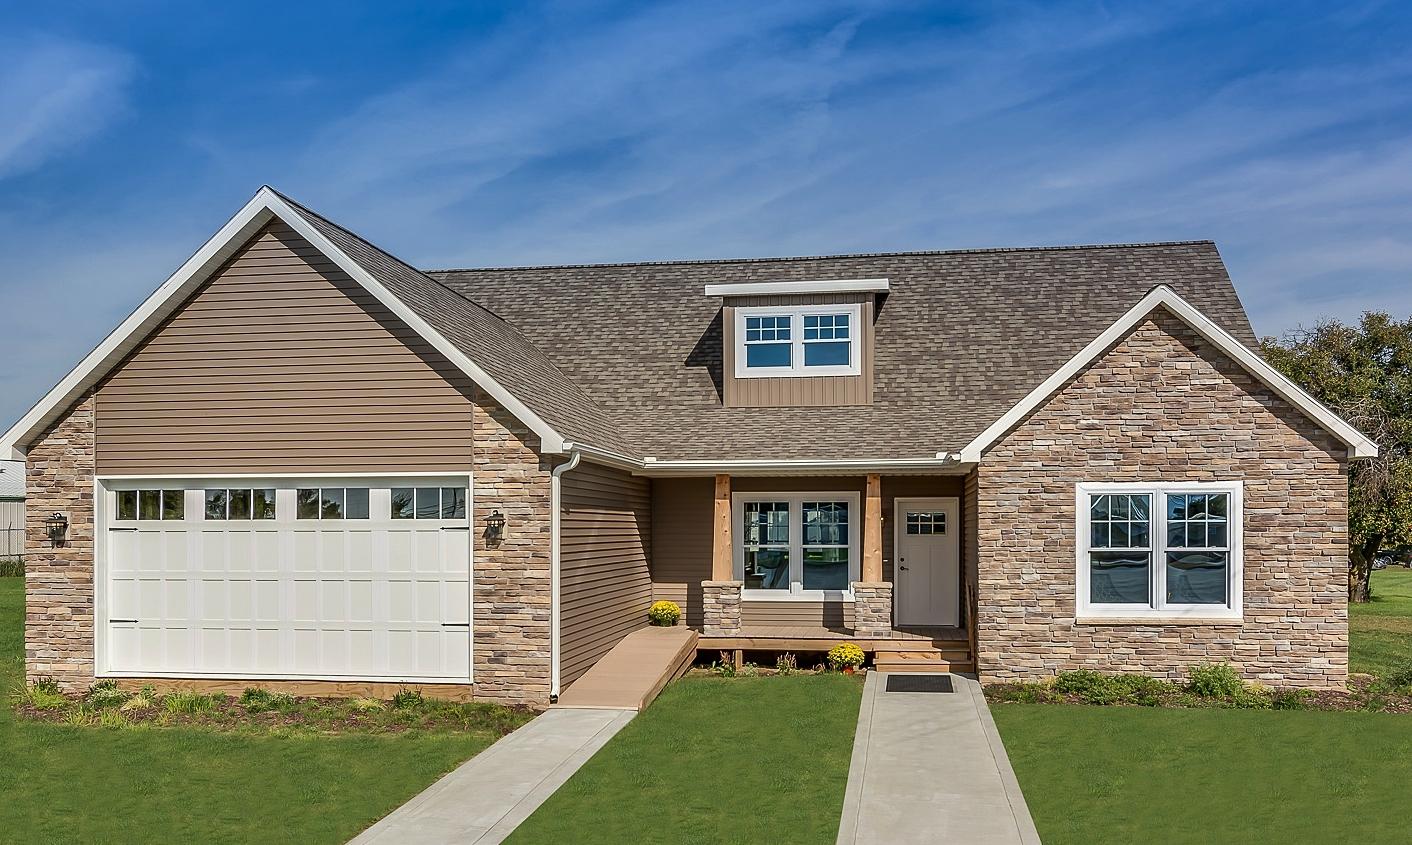 Premier Builders - Proud Builder of MHE, Heckaman and Fairmont Homes